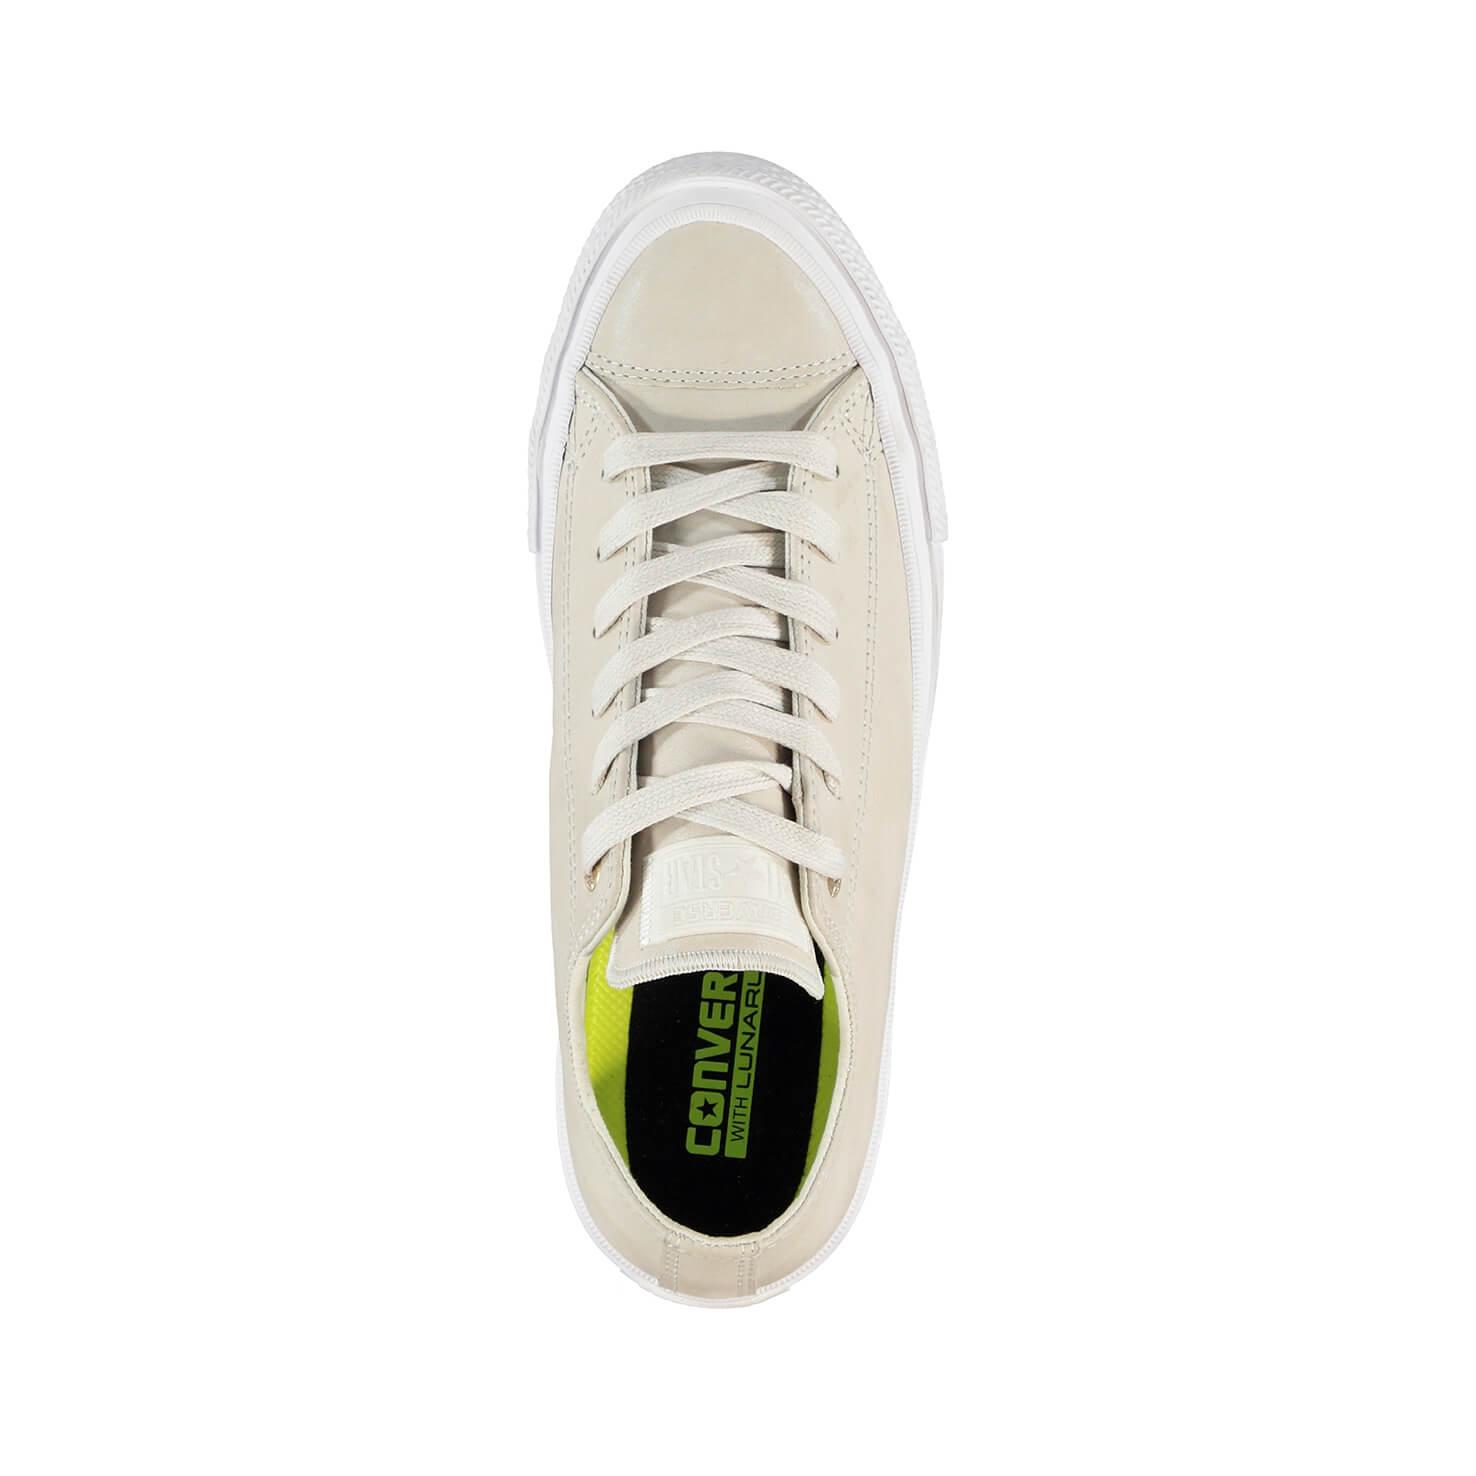 Converse Chuck Taylor All Star Ii Kadın Bej Sneaker